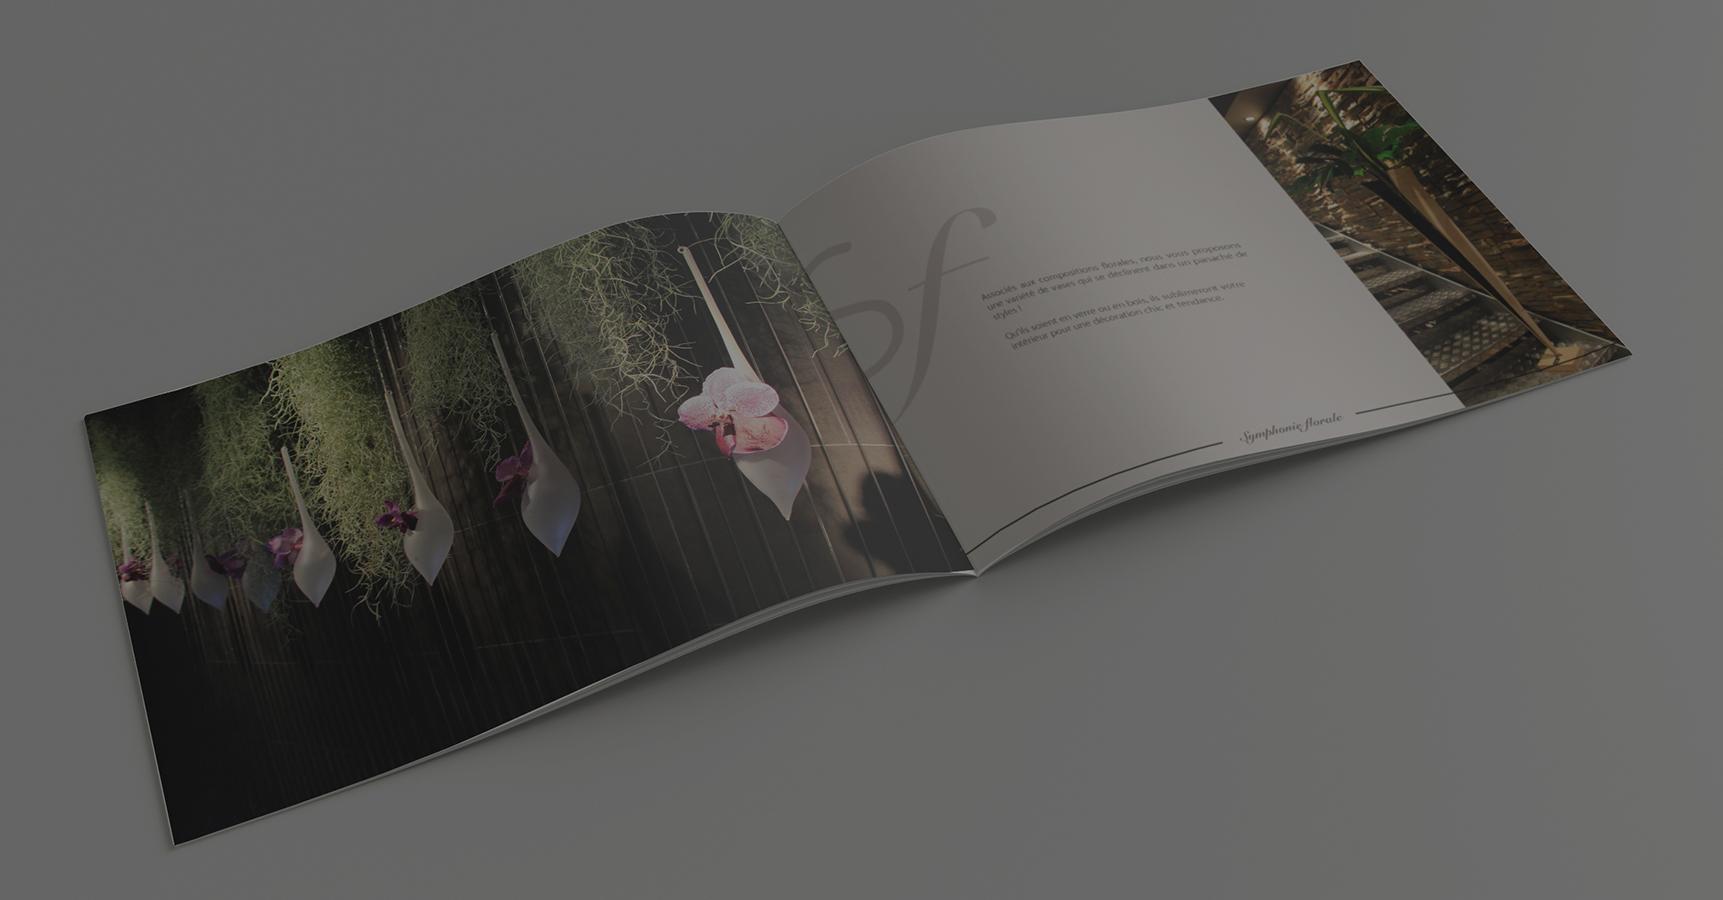 designer-graphique-montpellier-paris-freelance-brochure-edition